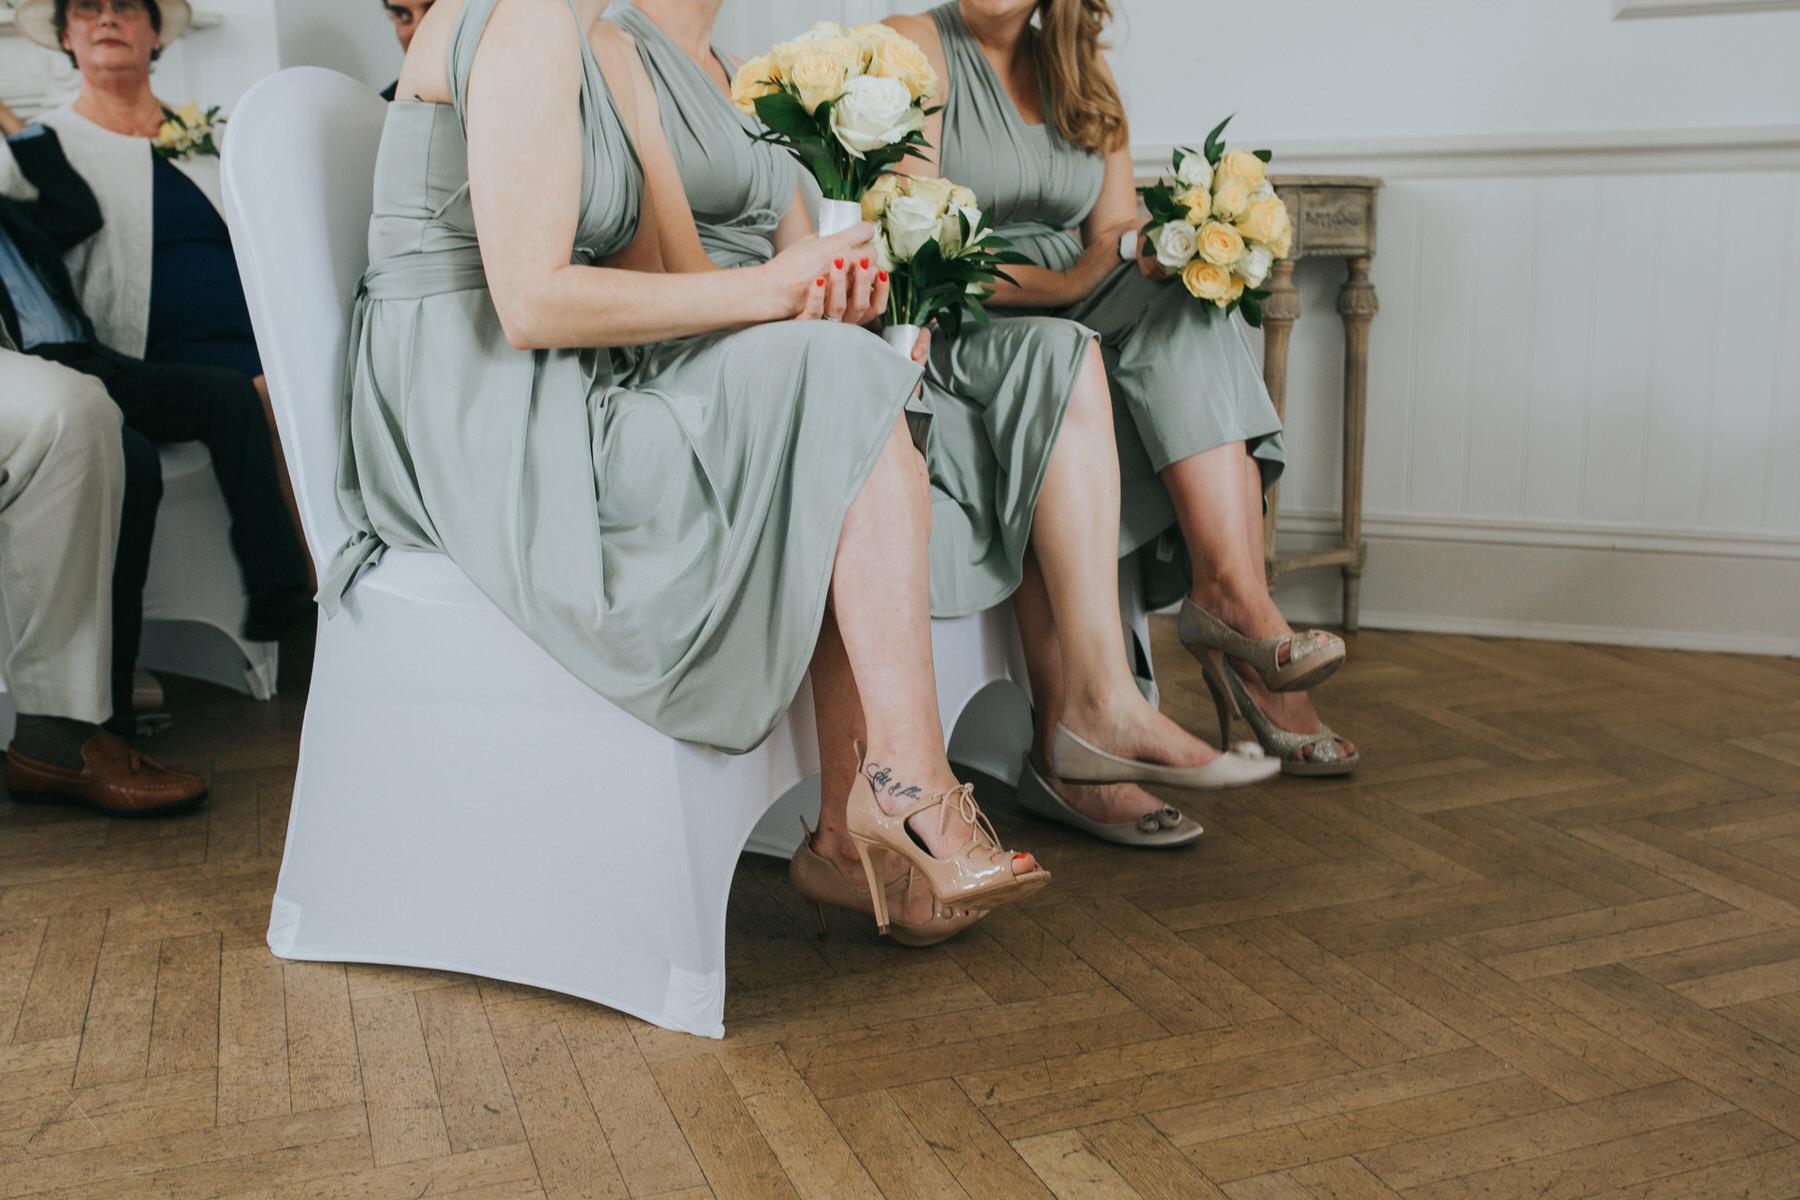 110 bridesmaids shoe shot parquet floor Belair House.jpg